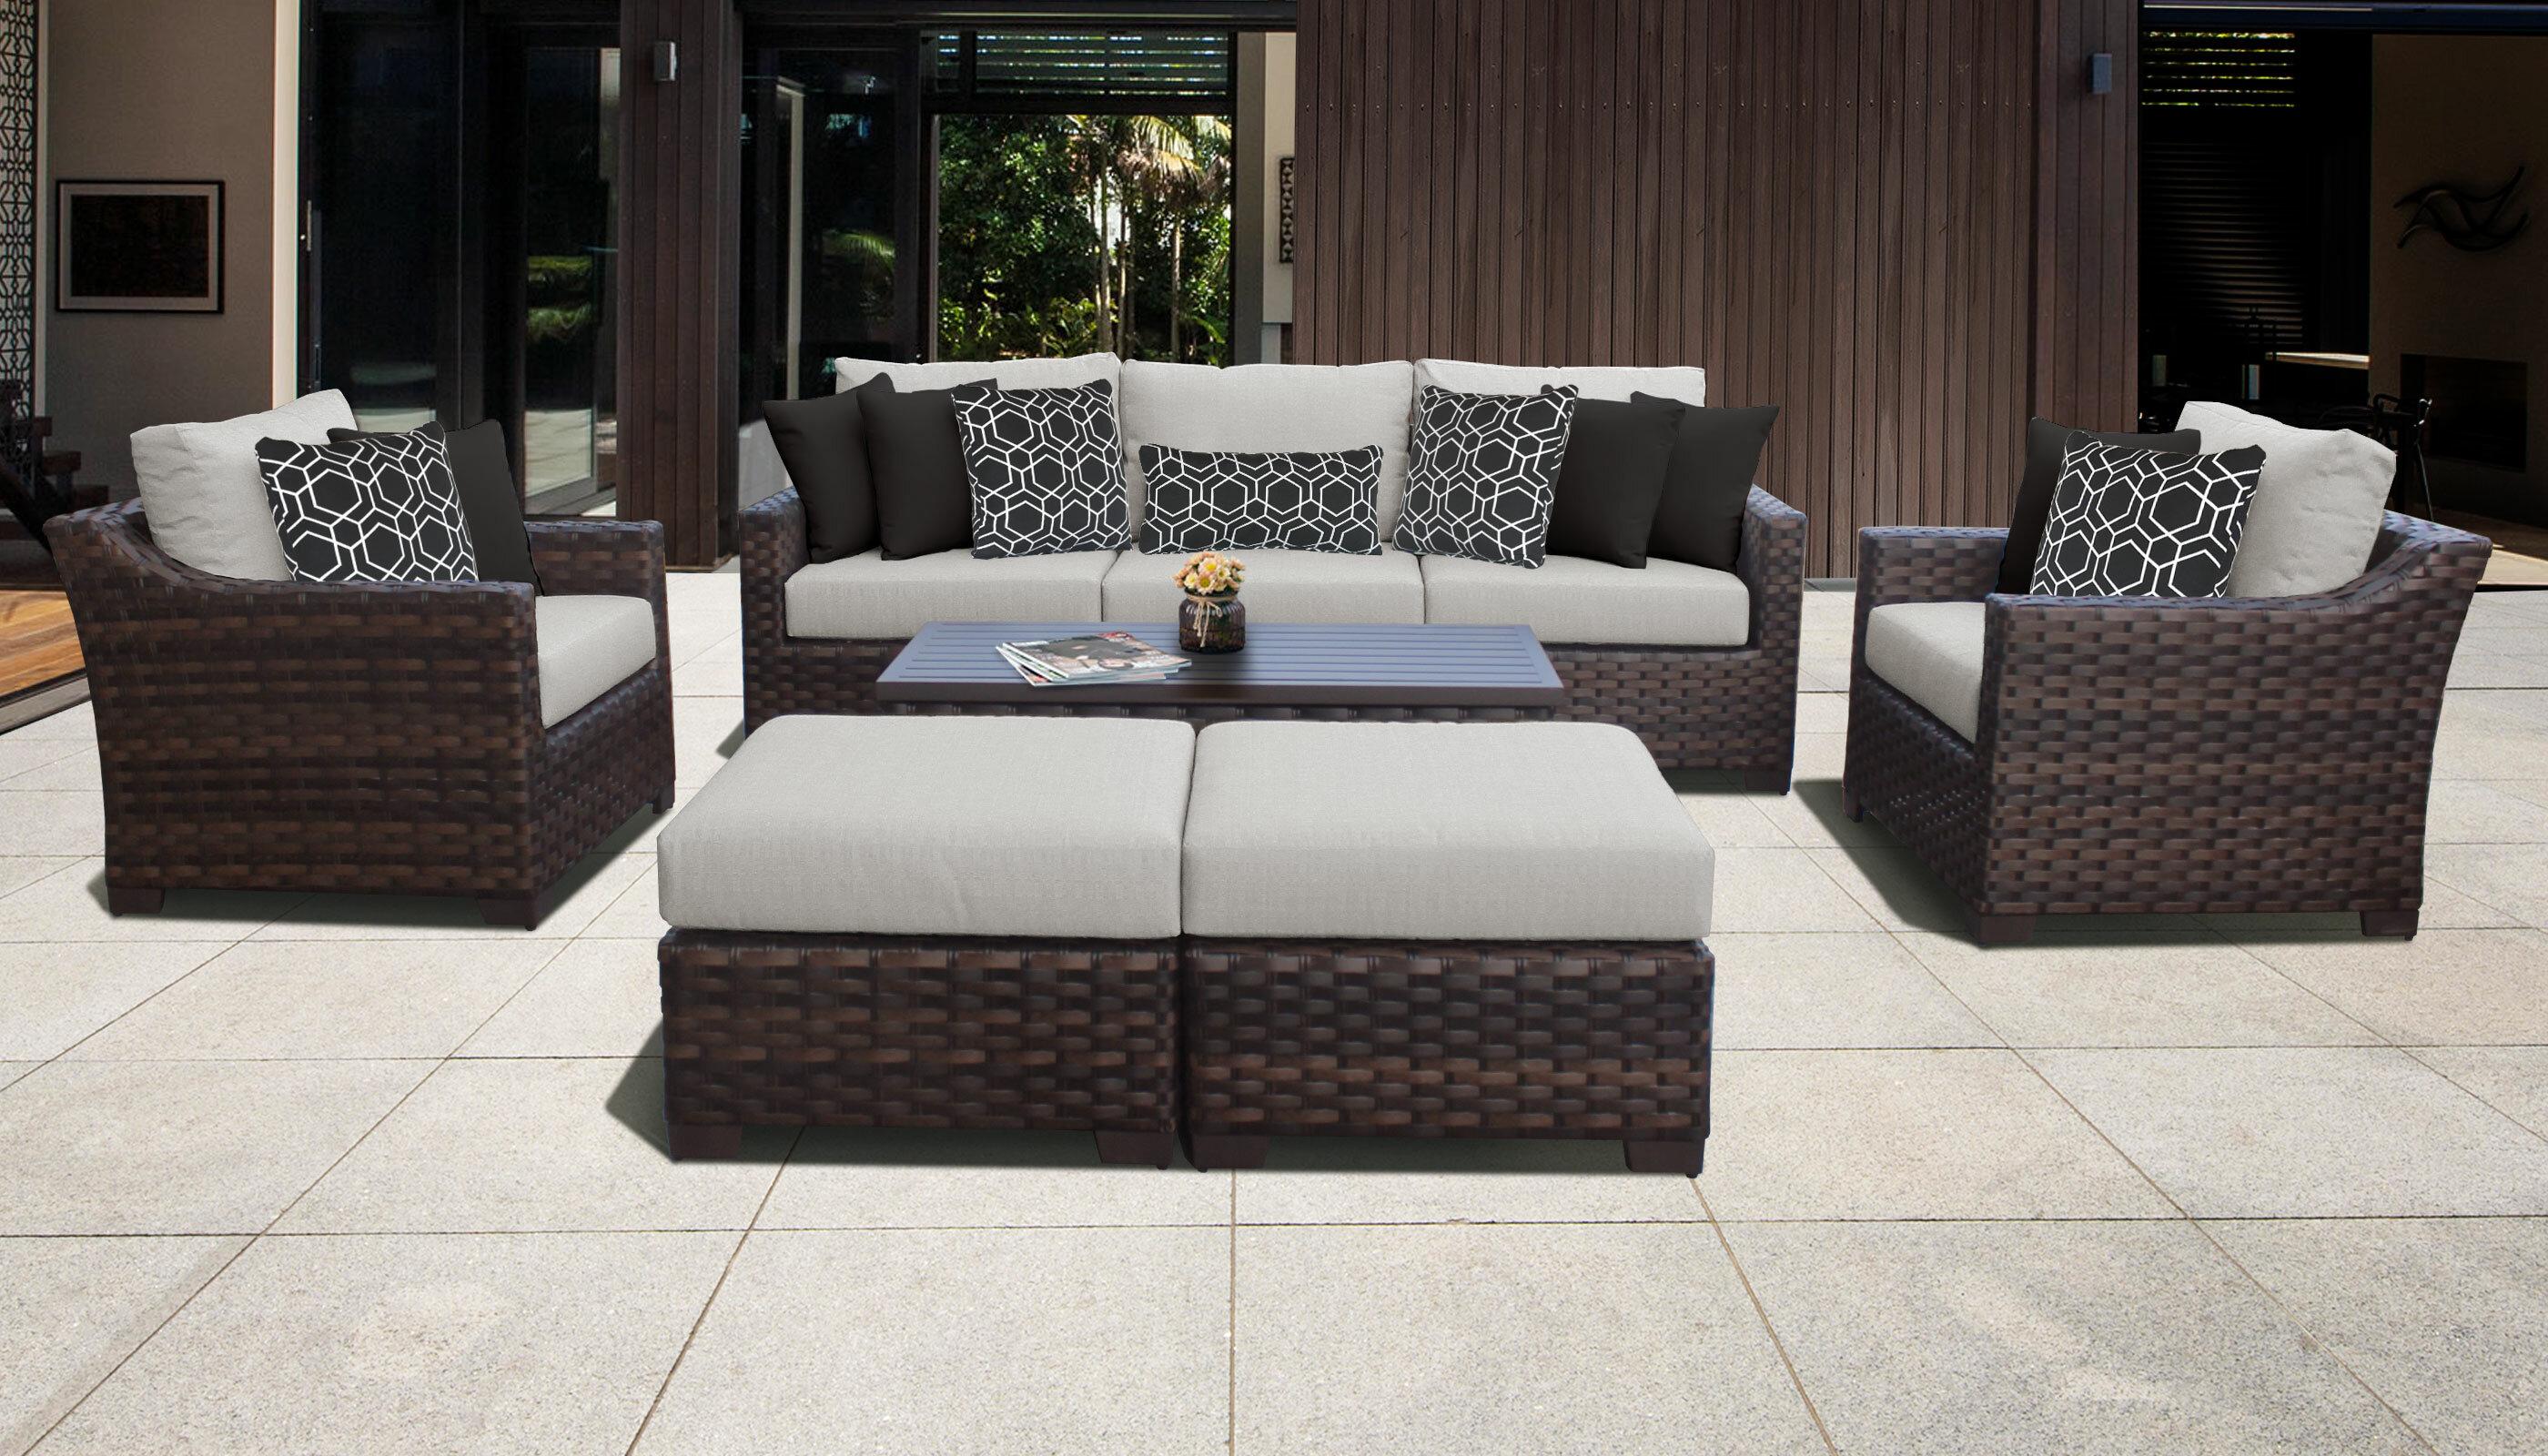 kathy ireland Homes & Gardens River Brook 8 Piece Outdoor Wicker Patio  Furniture Set 08c